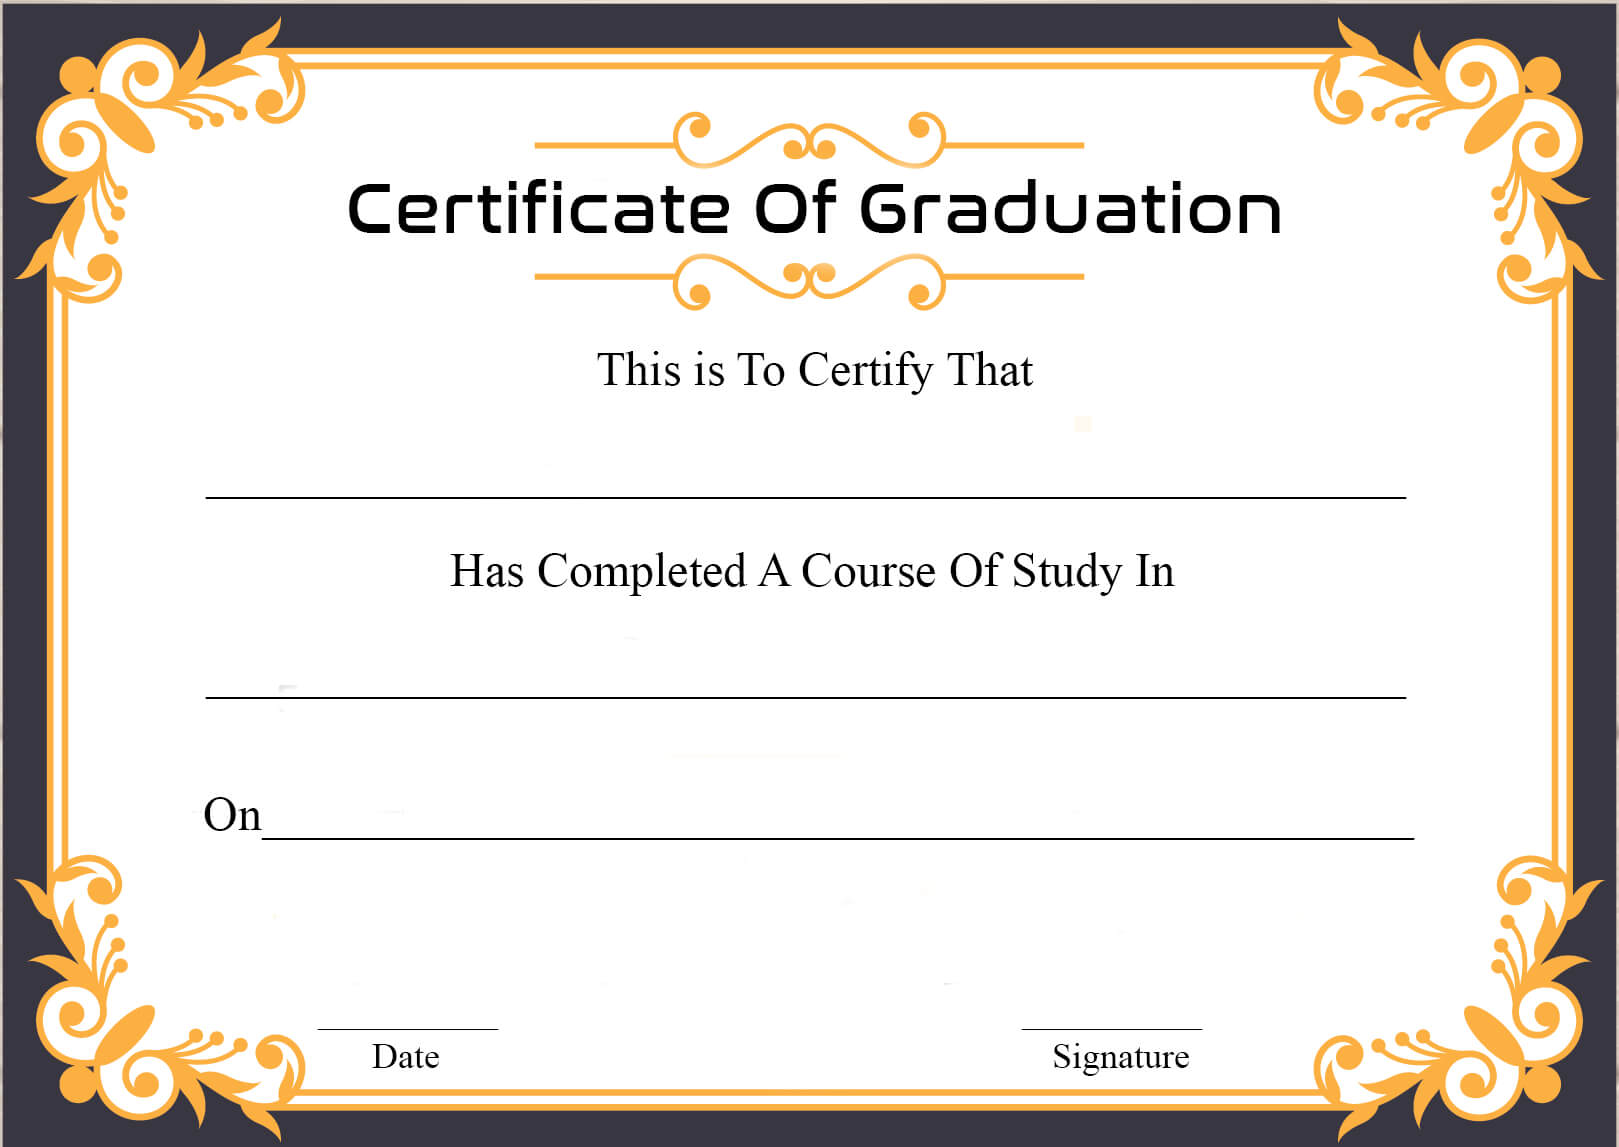 🥰free Certificate Template Of Graduation Download🥰 Intended For Free Student Certificate Templates